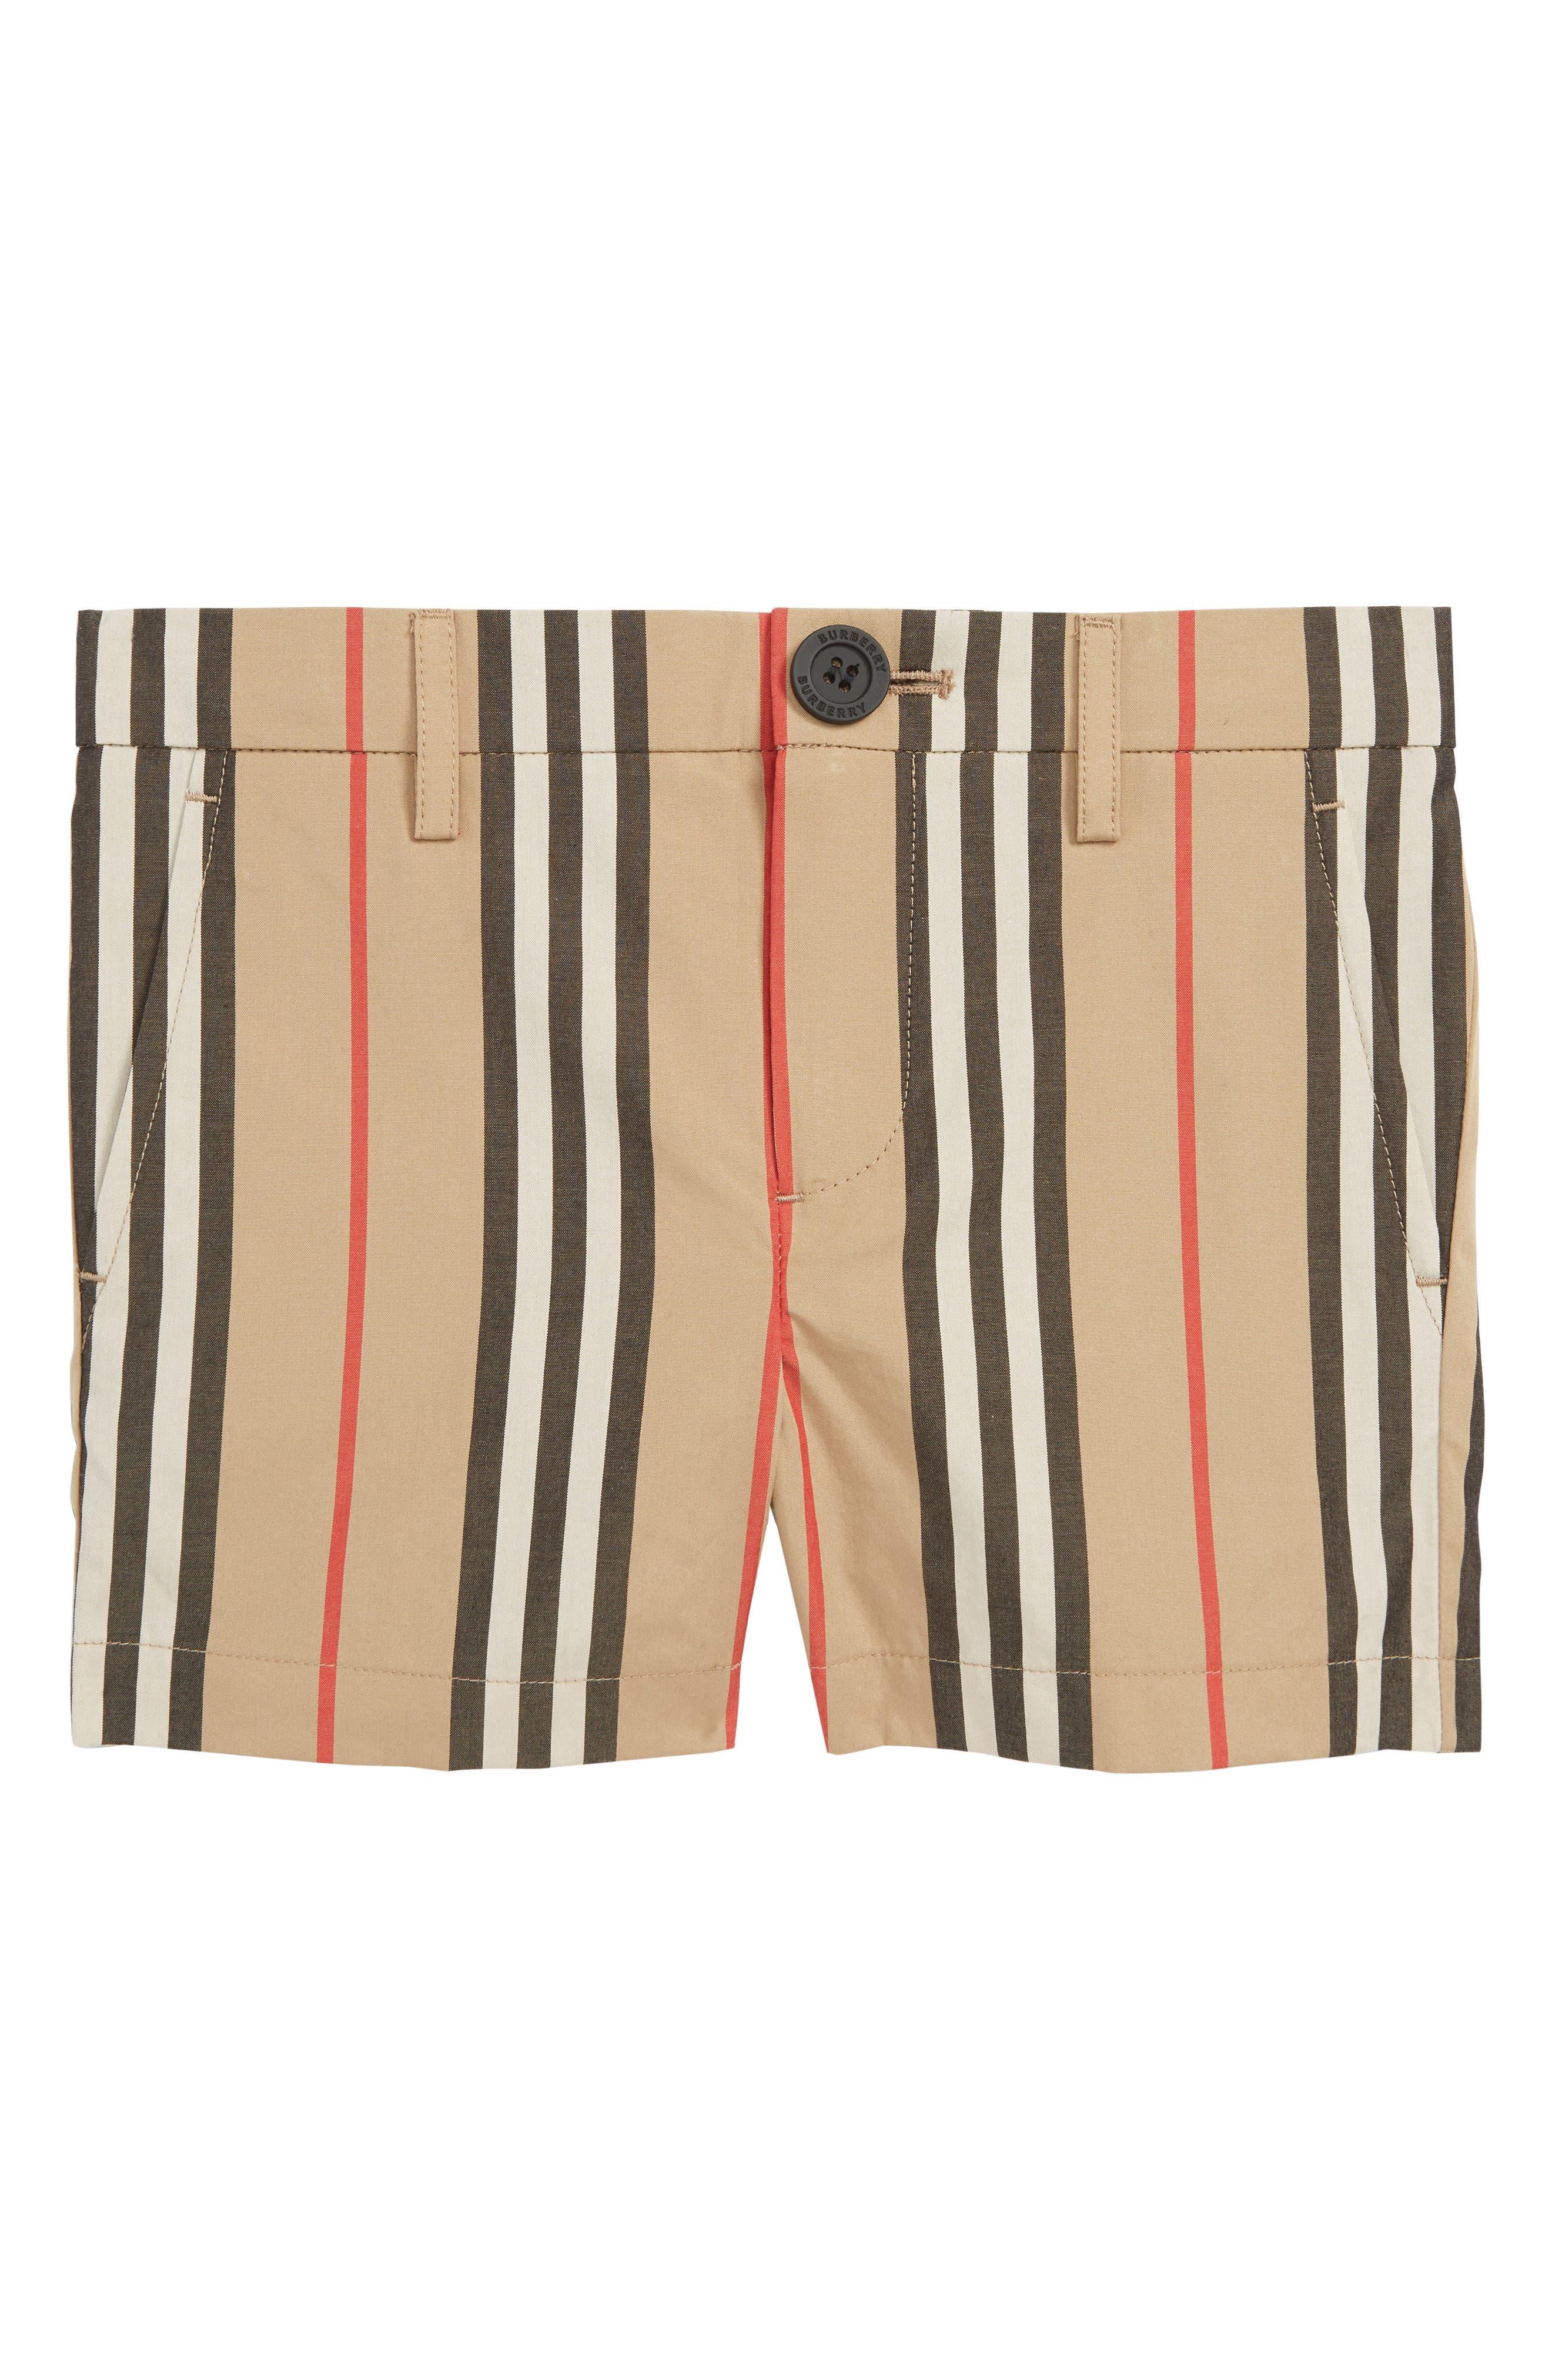 BURBERRY Nicki Stripe Shorts, Main, color, ARCHIVE BEIGE